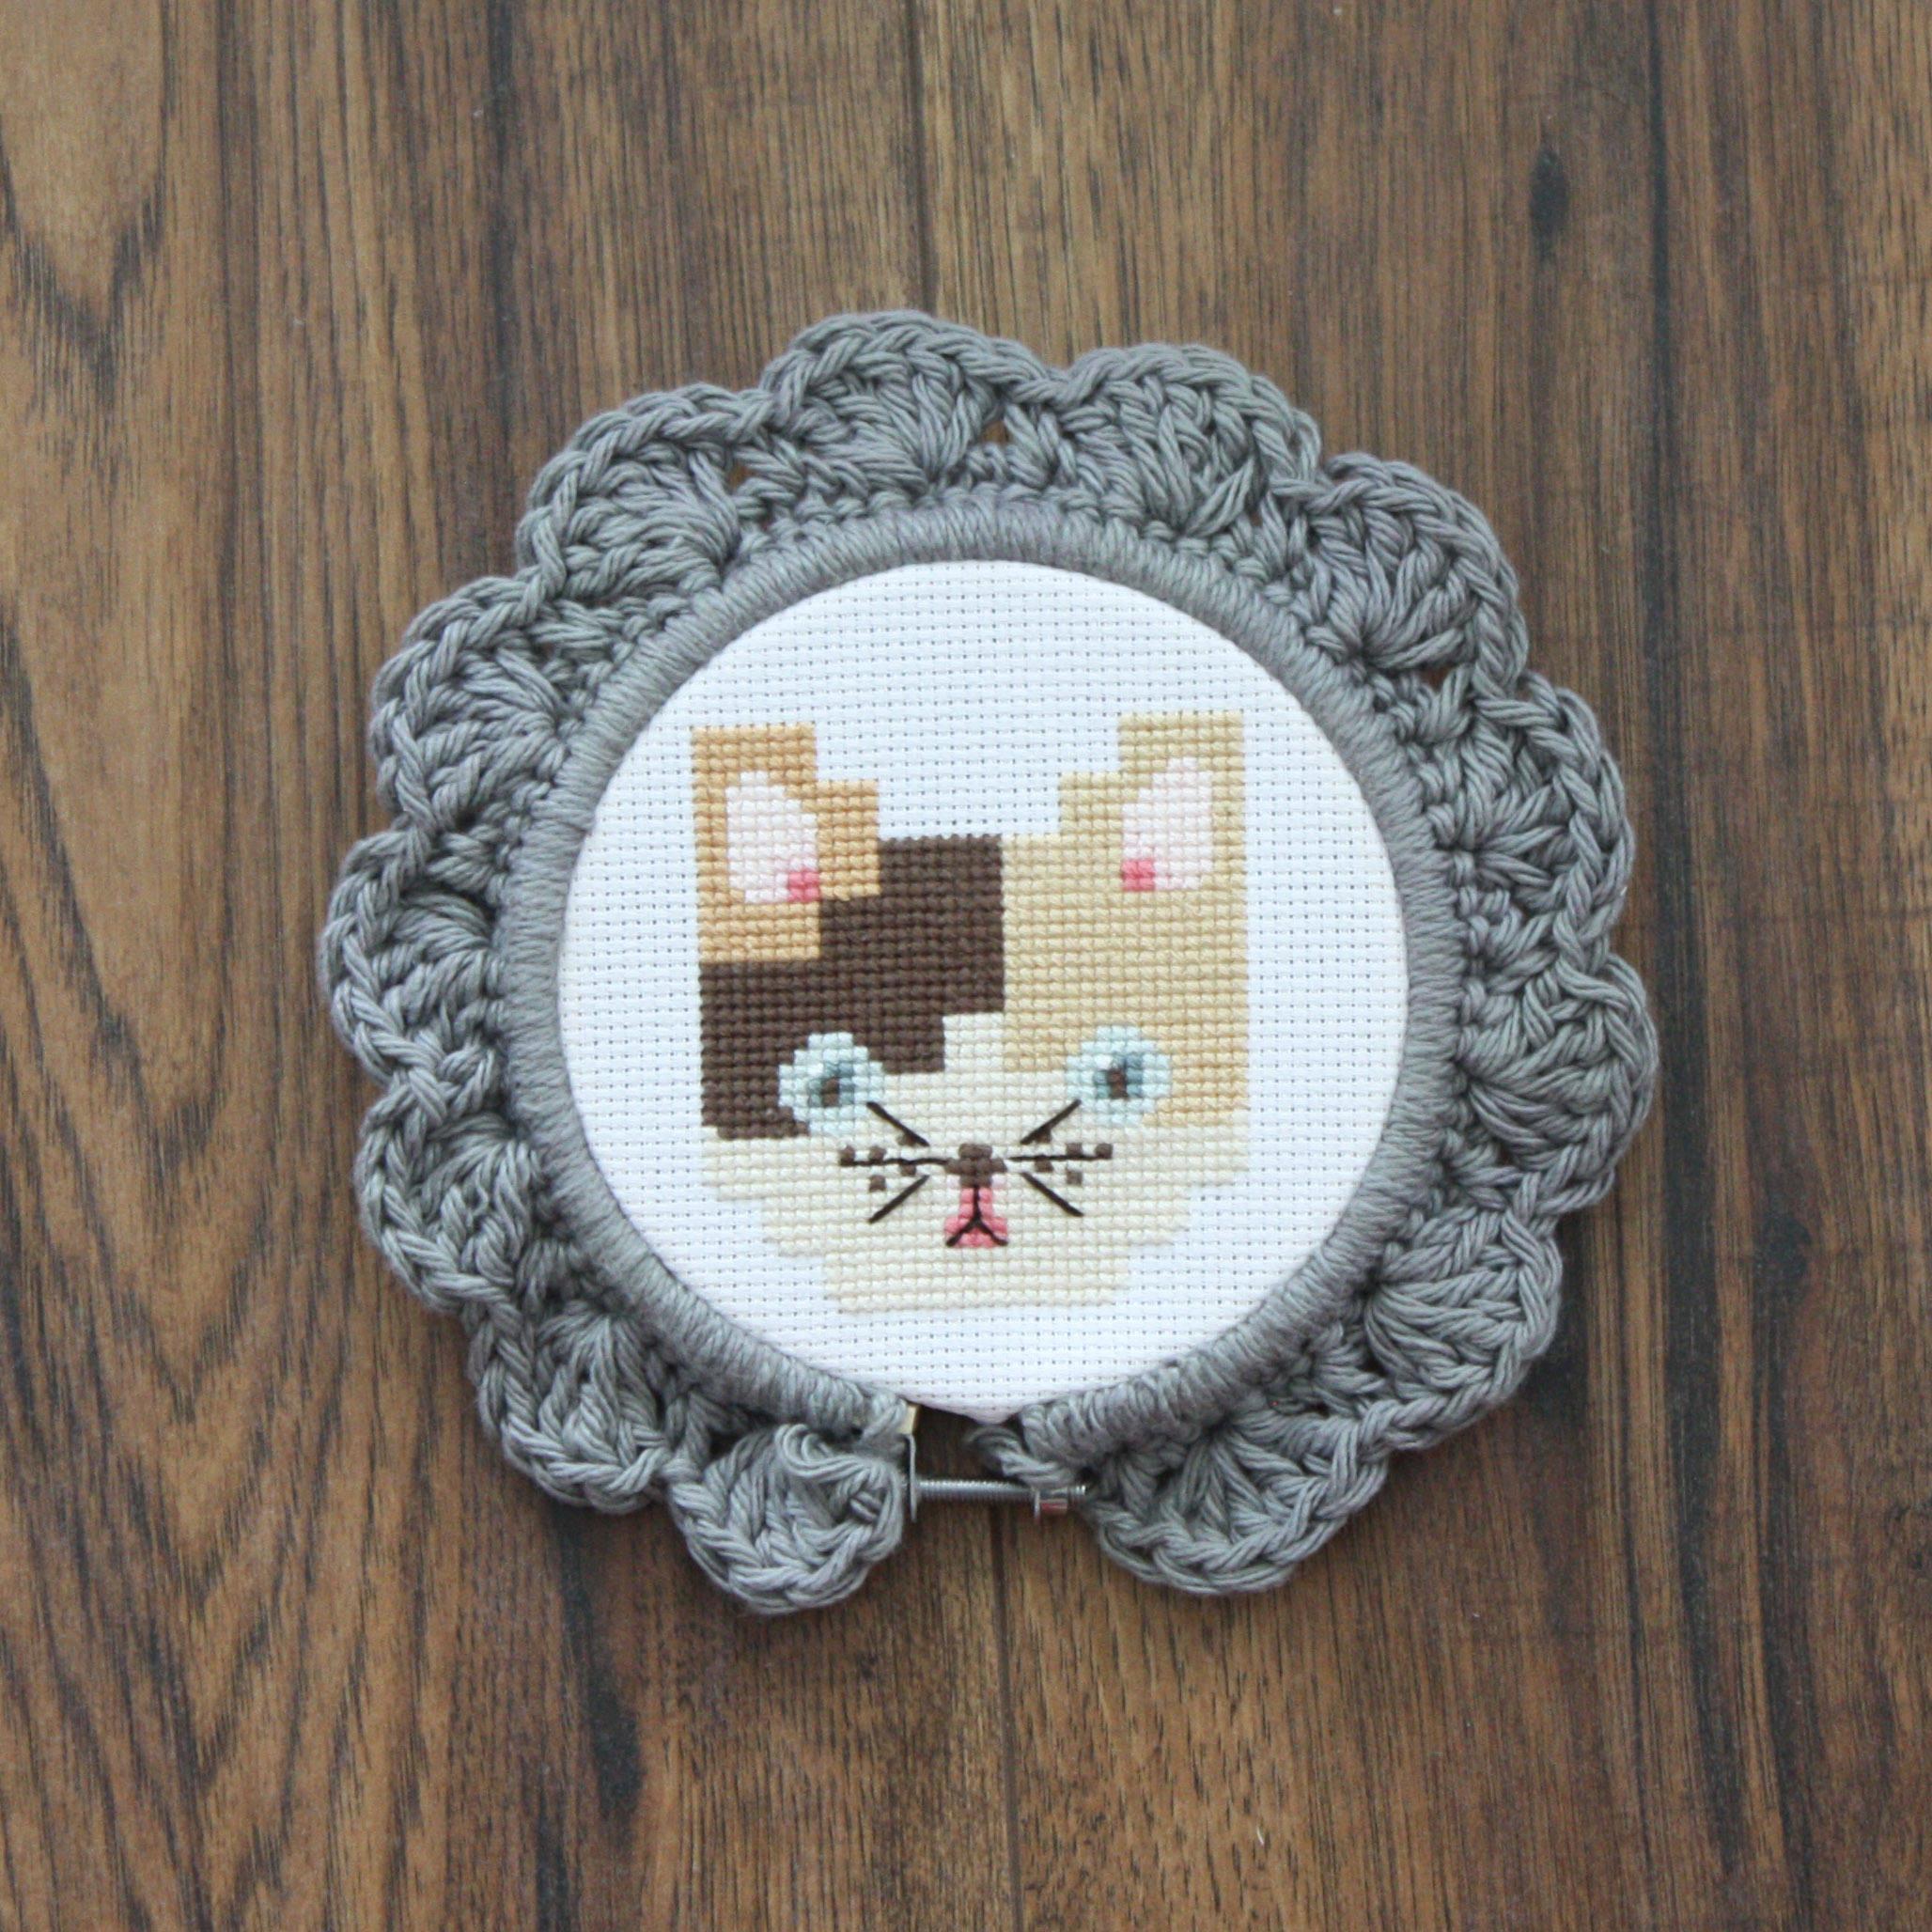 Handmade Crochet Embroidery Hoop Frame Grey Small - home decor ...